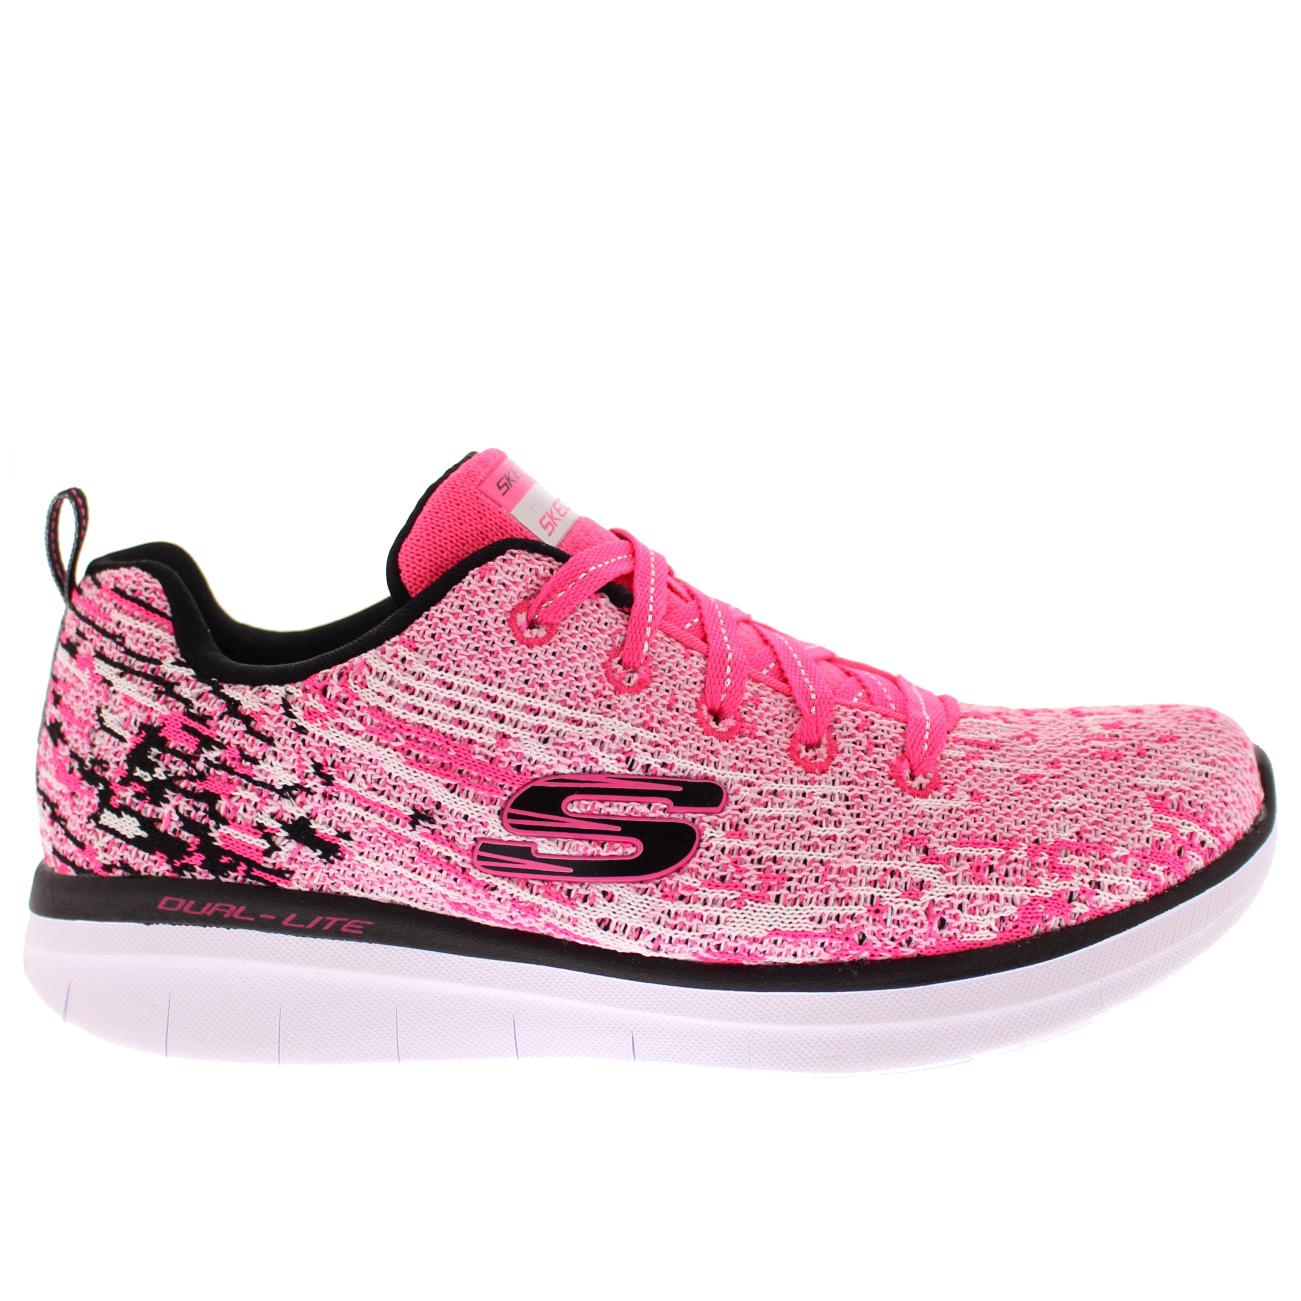 Skechers Women's Synergy 2.0 High Spirits Pink Black